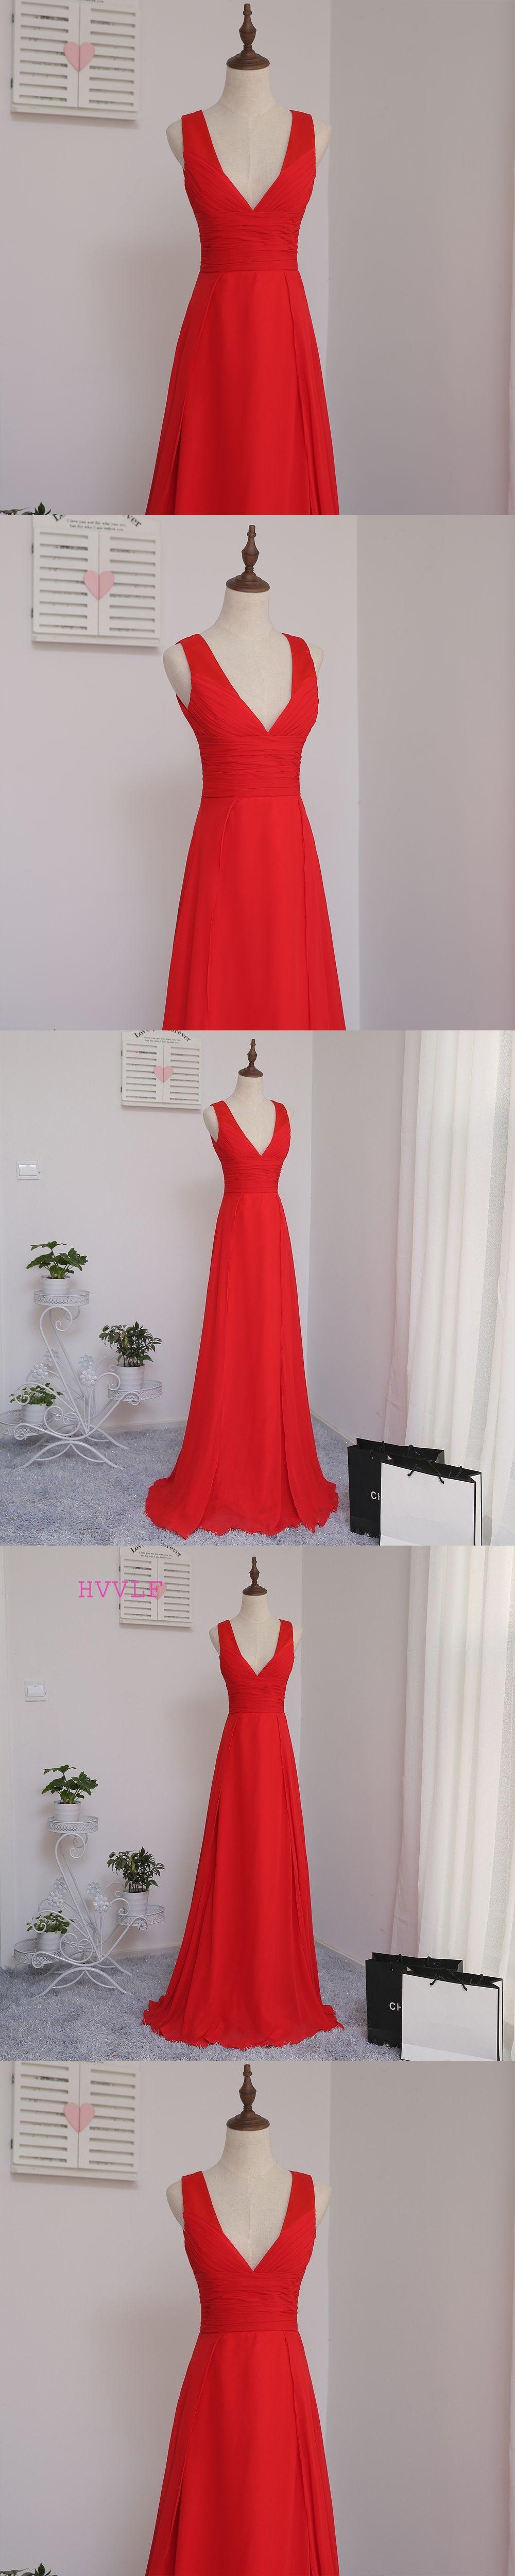 Wedding party dresses · HVVLF 2018 Cheap Bridesmaid Dresses Under 50 A-line  Deep V-neck Red Chiffon 76564cd78af4